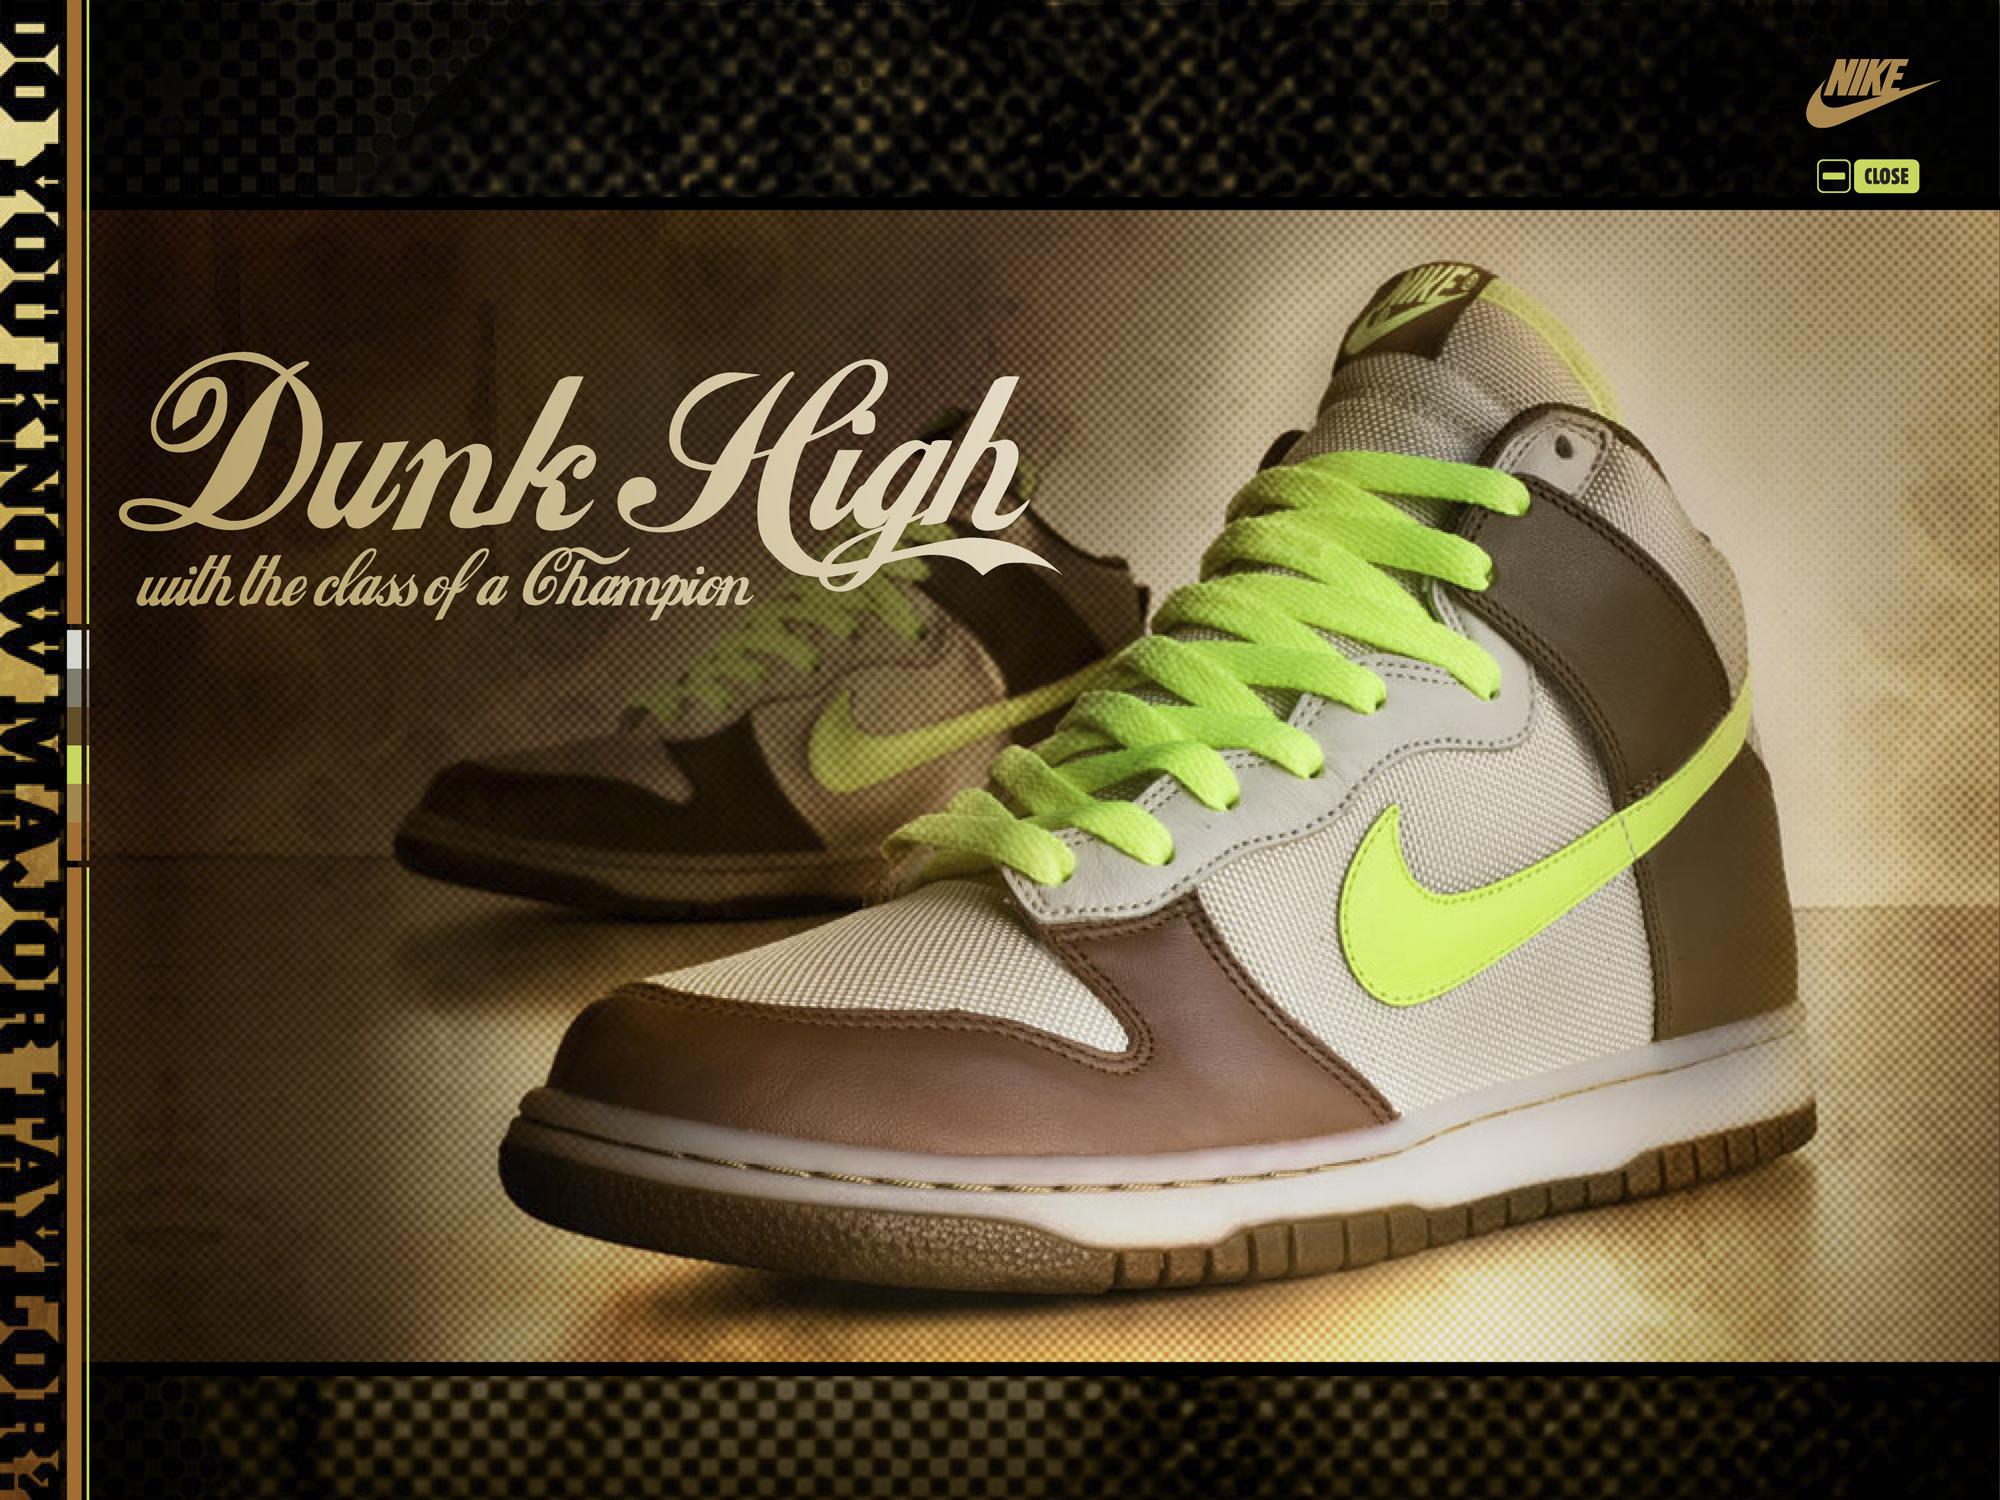 Website display of nike shoes